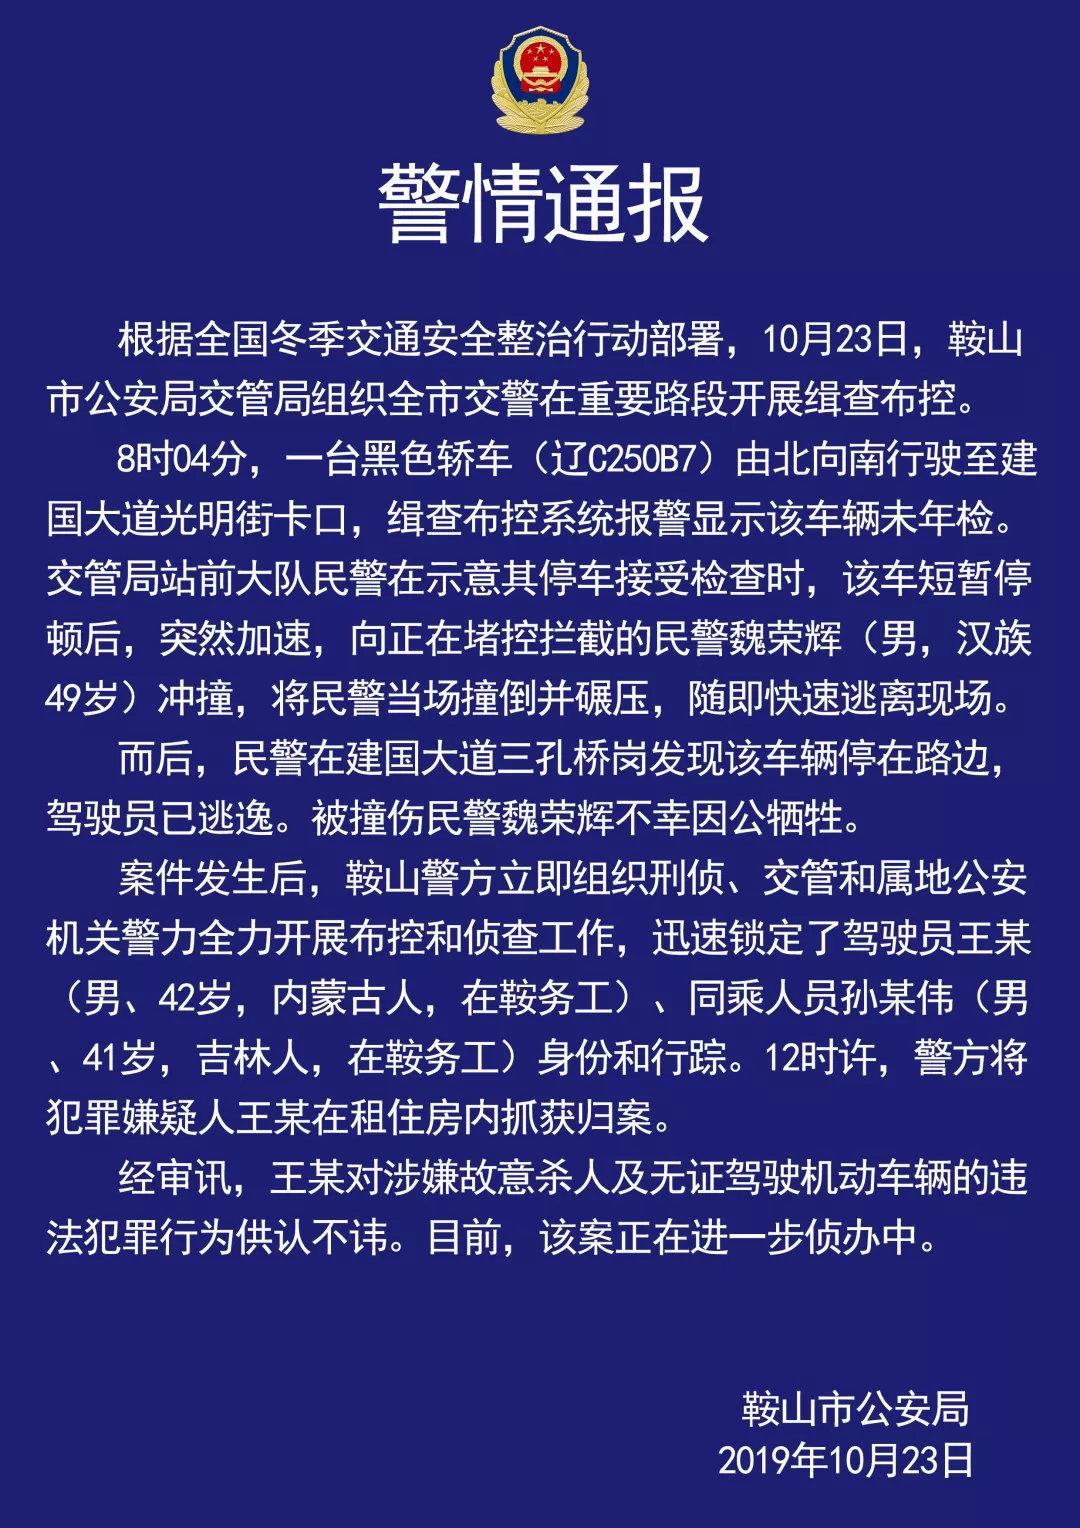 http://www.gweeft.live/caijingfenxi/47293.html